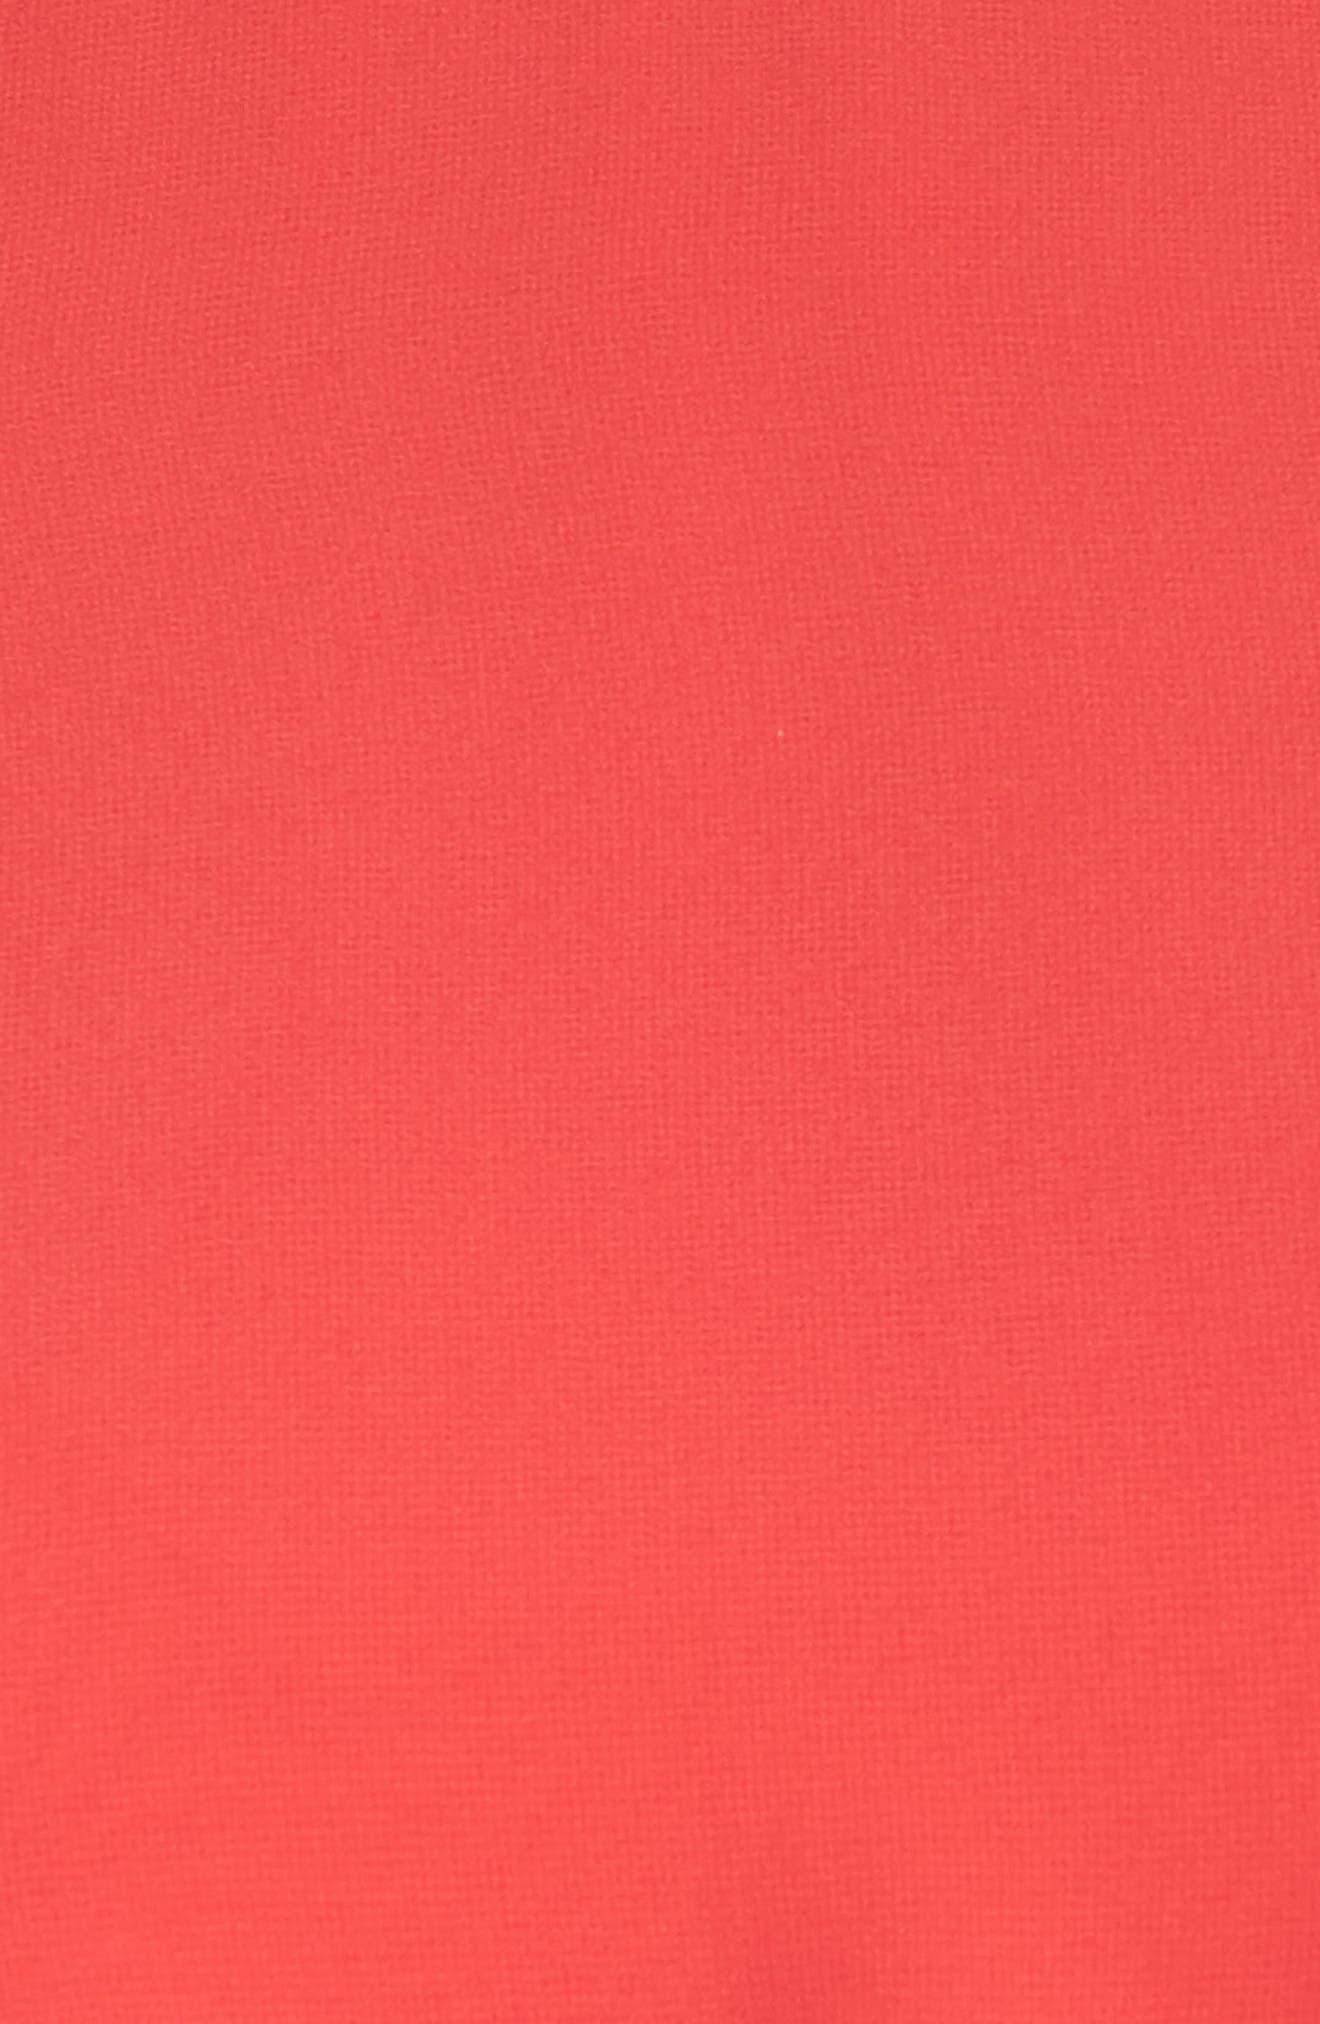 Cold Shoulder Midi Dress,                             Alternate thumbnail 5, color,                             650